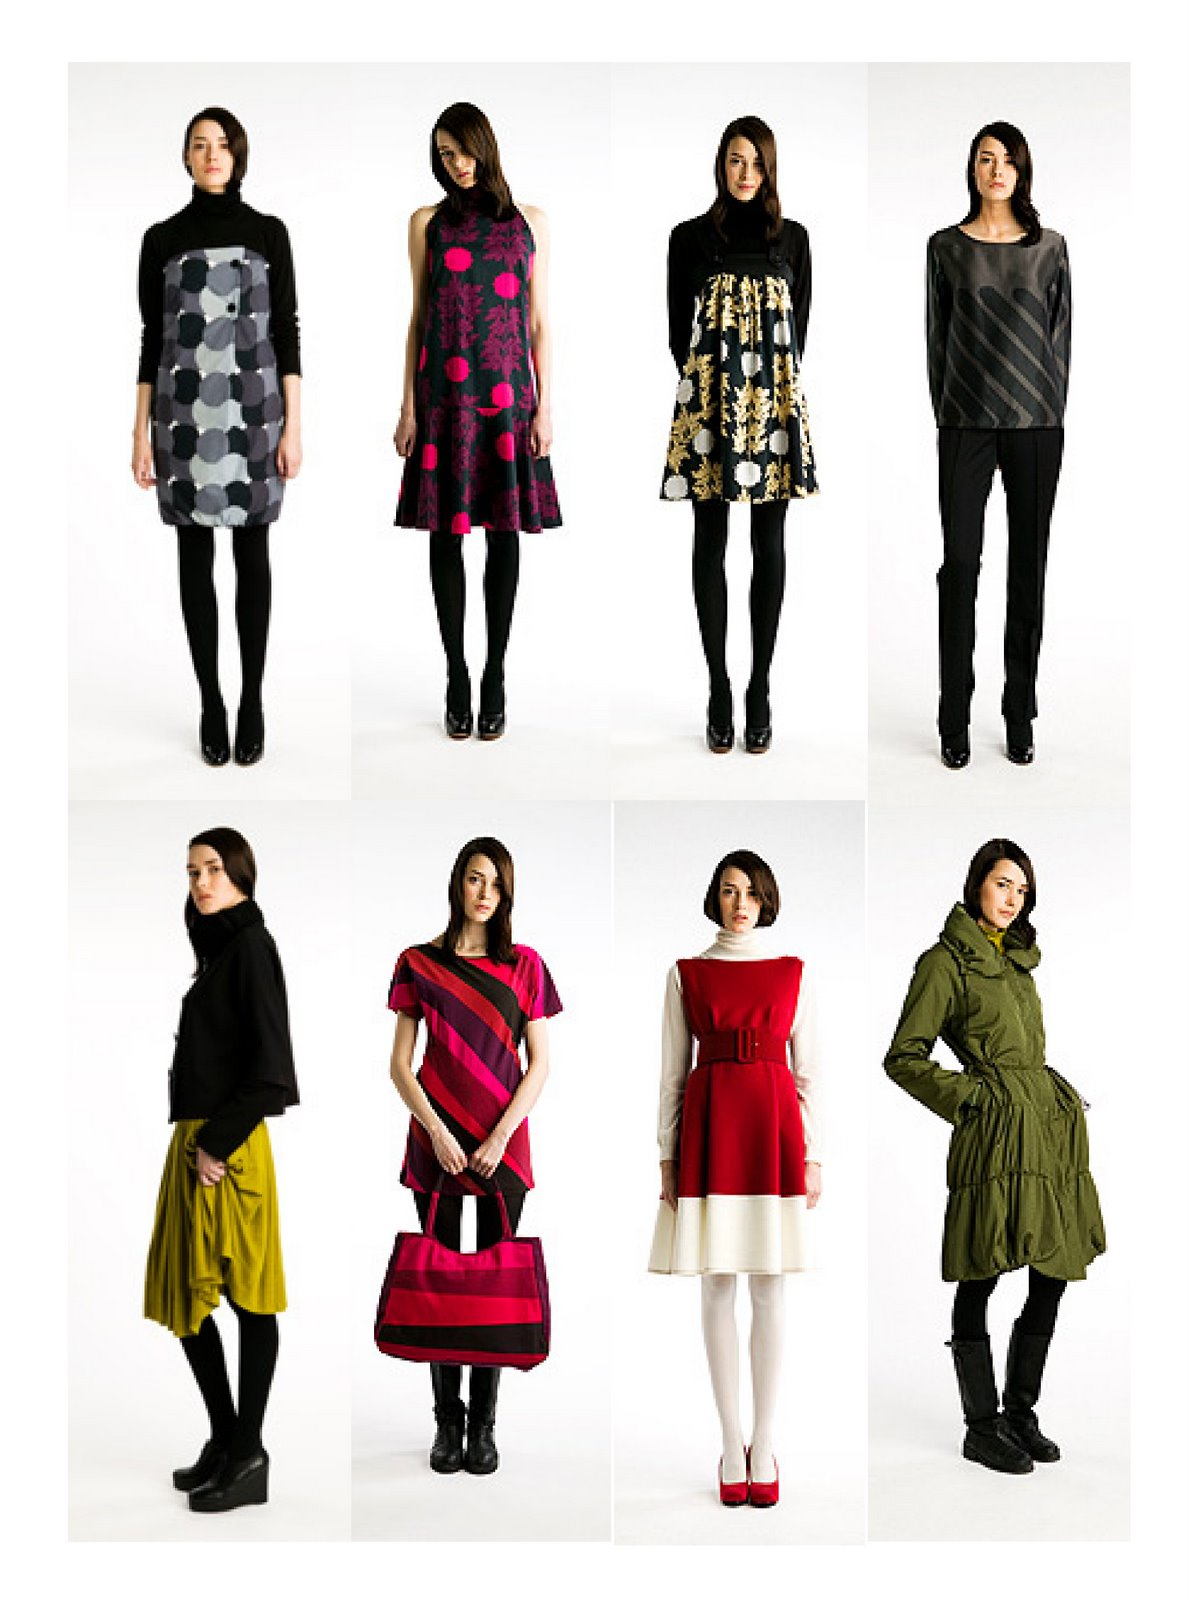 [Marimekko_clothes4.jpg]